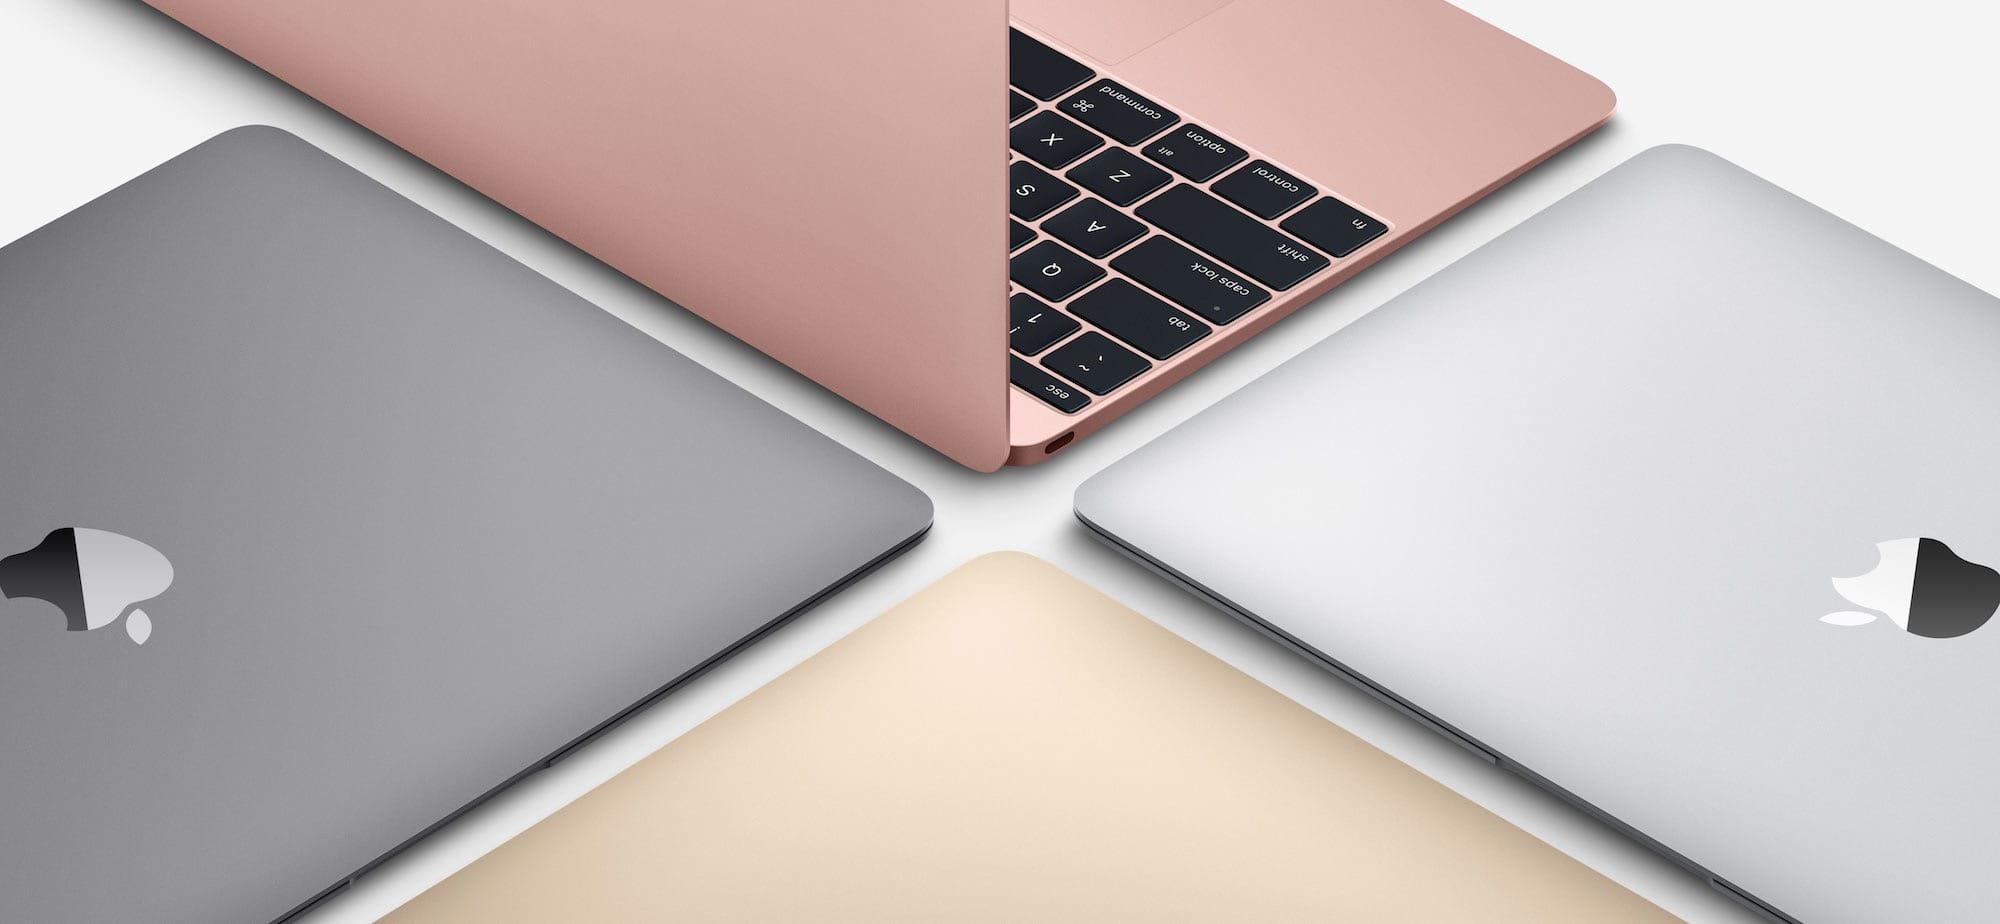 MacBook-early-2016-01-hero